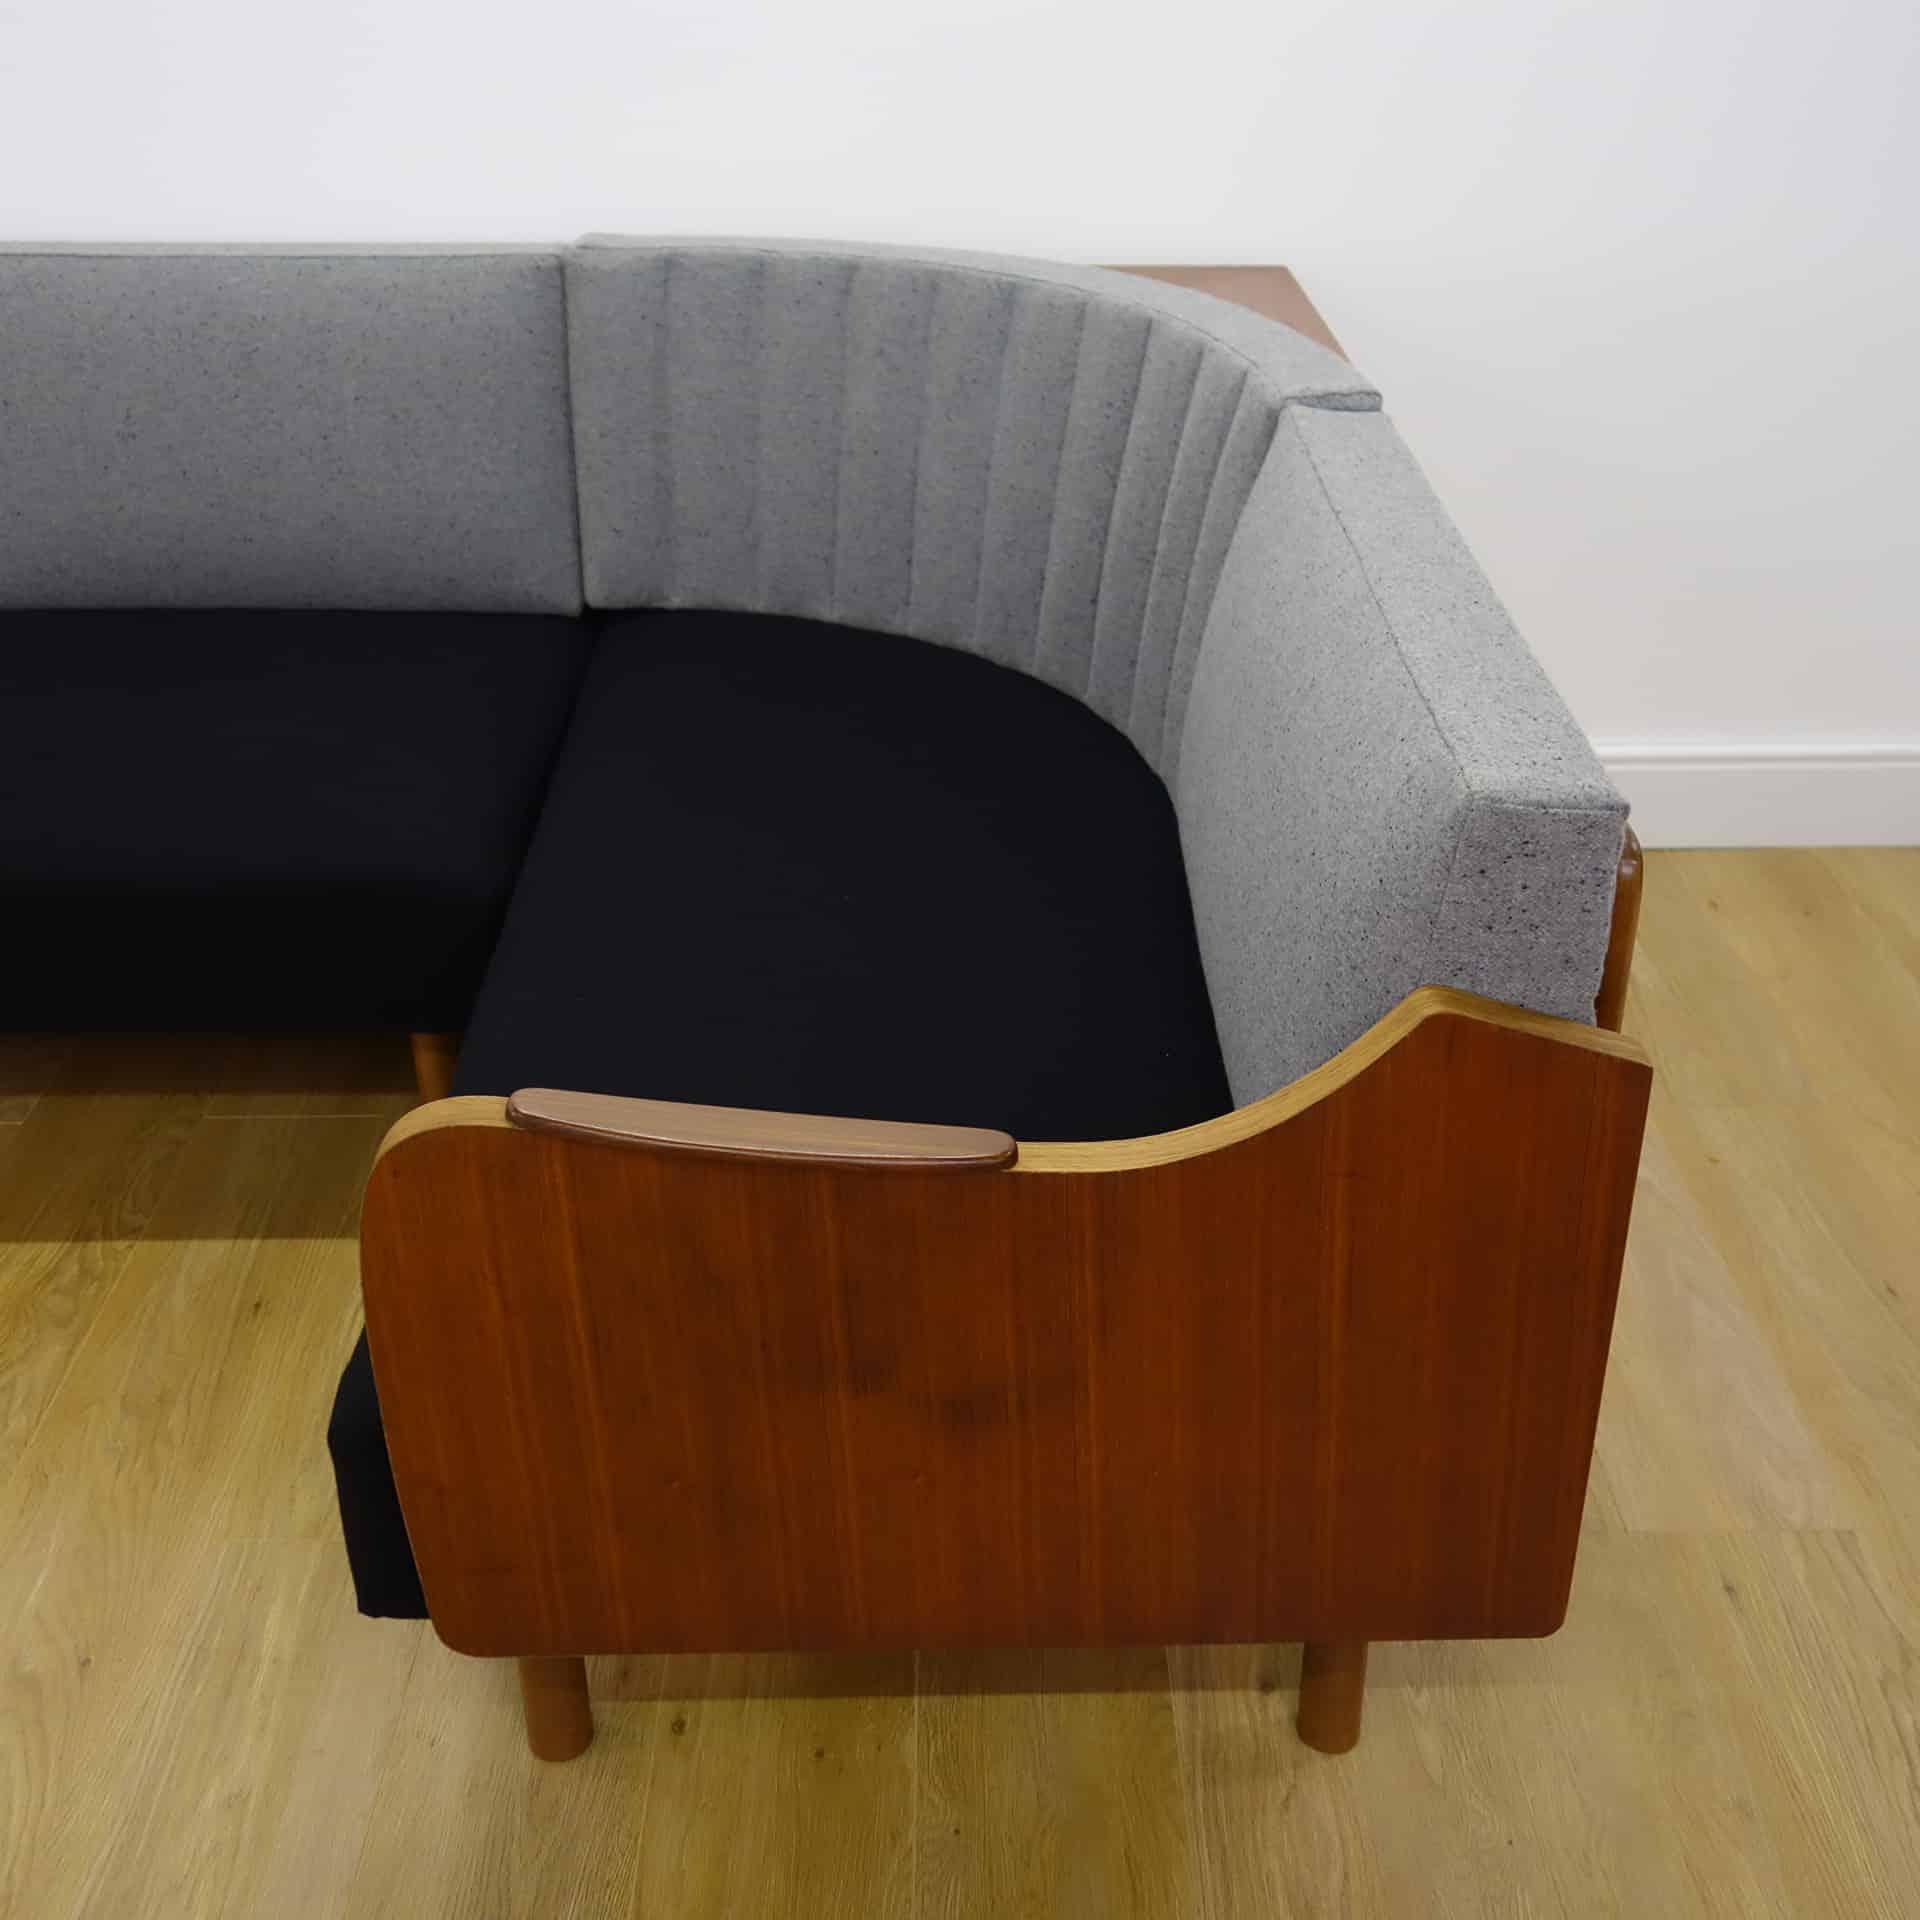 danish style sofa bed uk two cushion covers 1960s teak corner day mark parrish mid